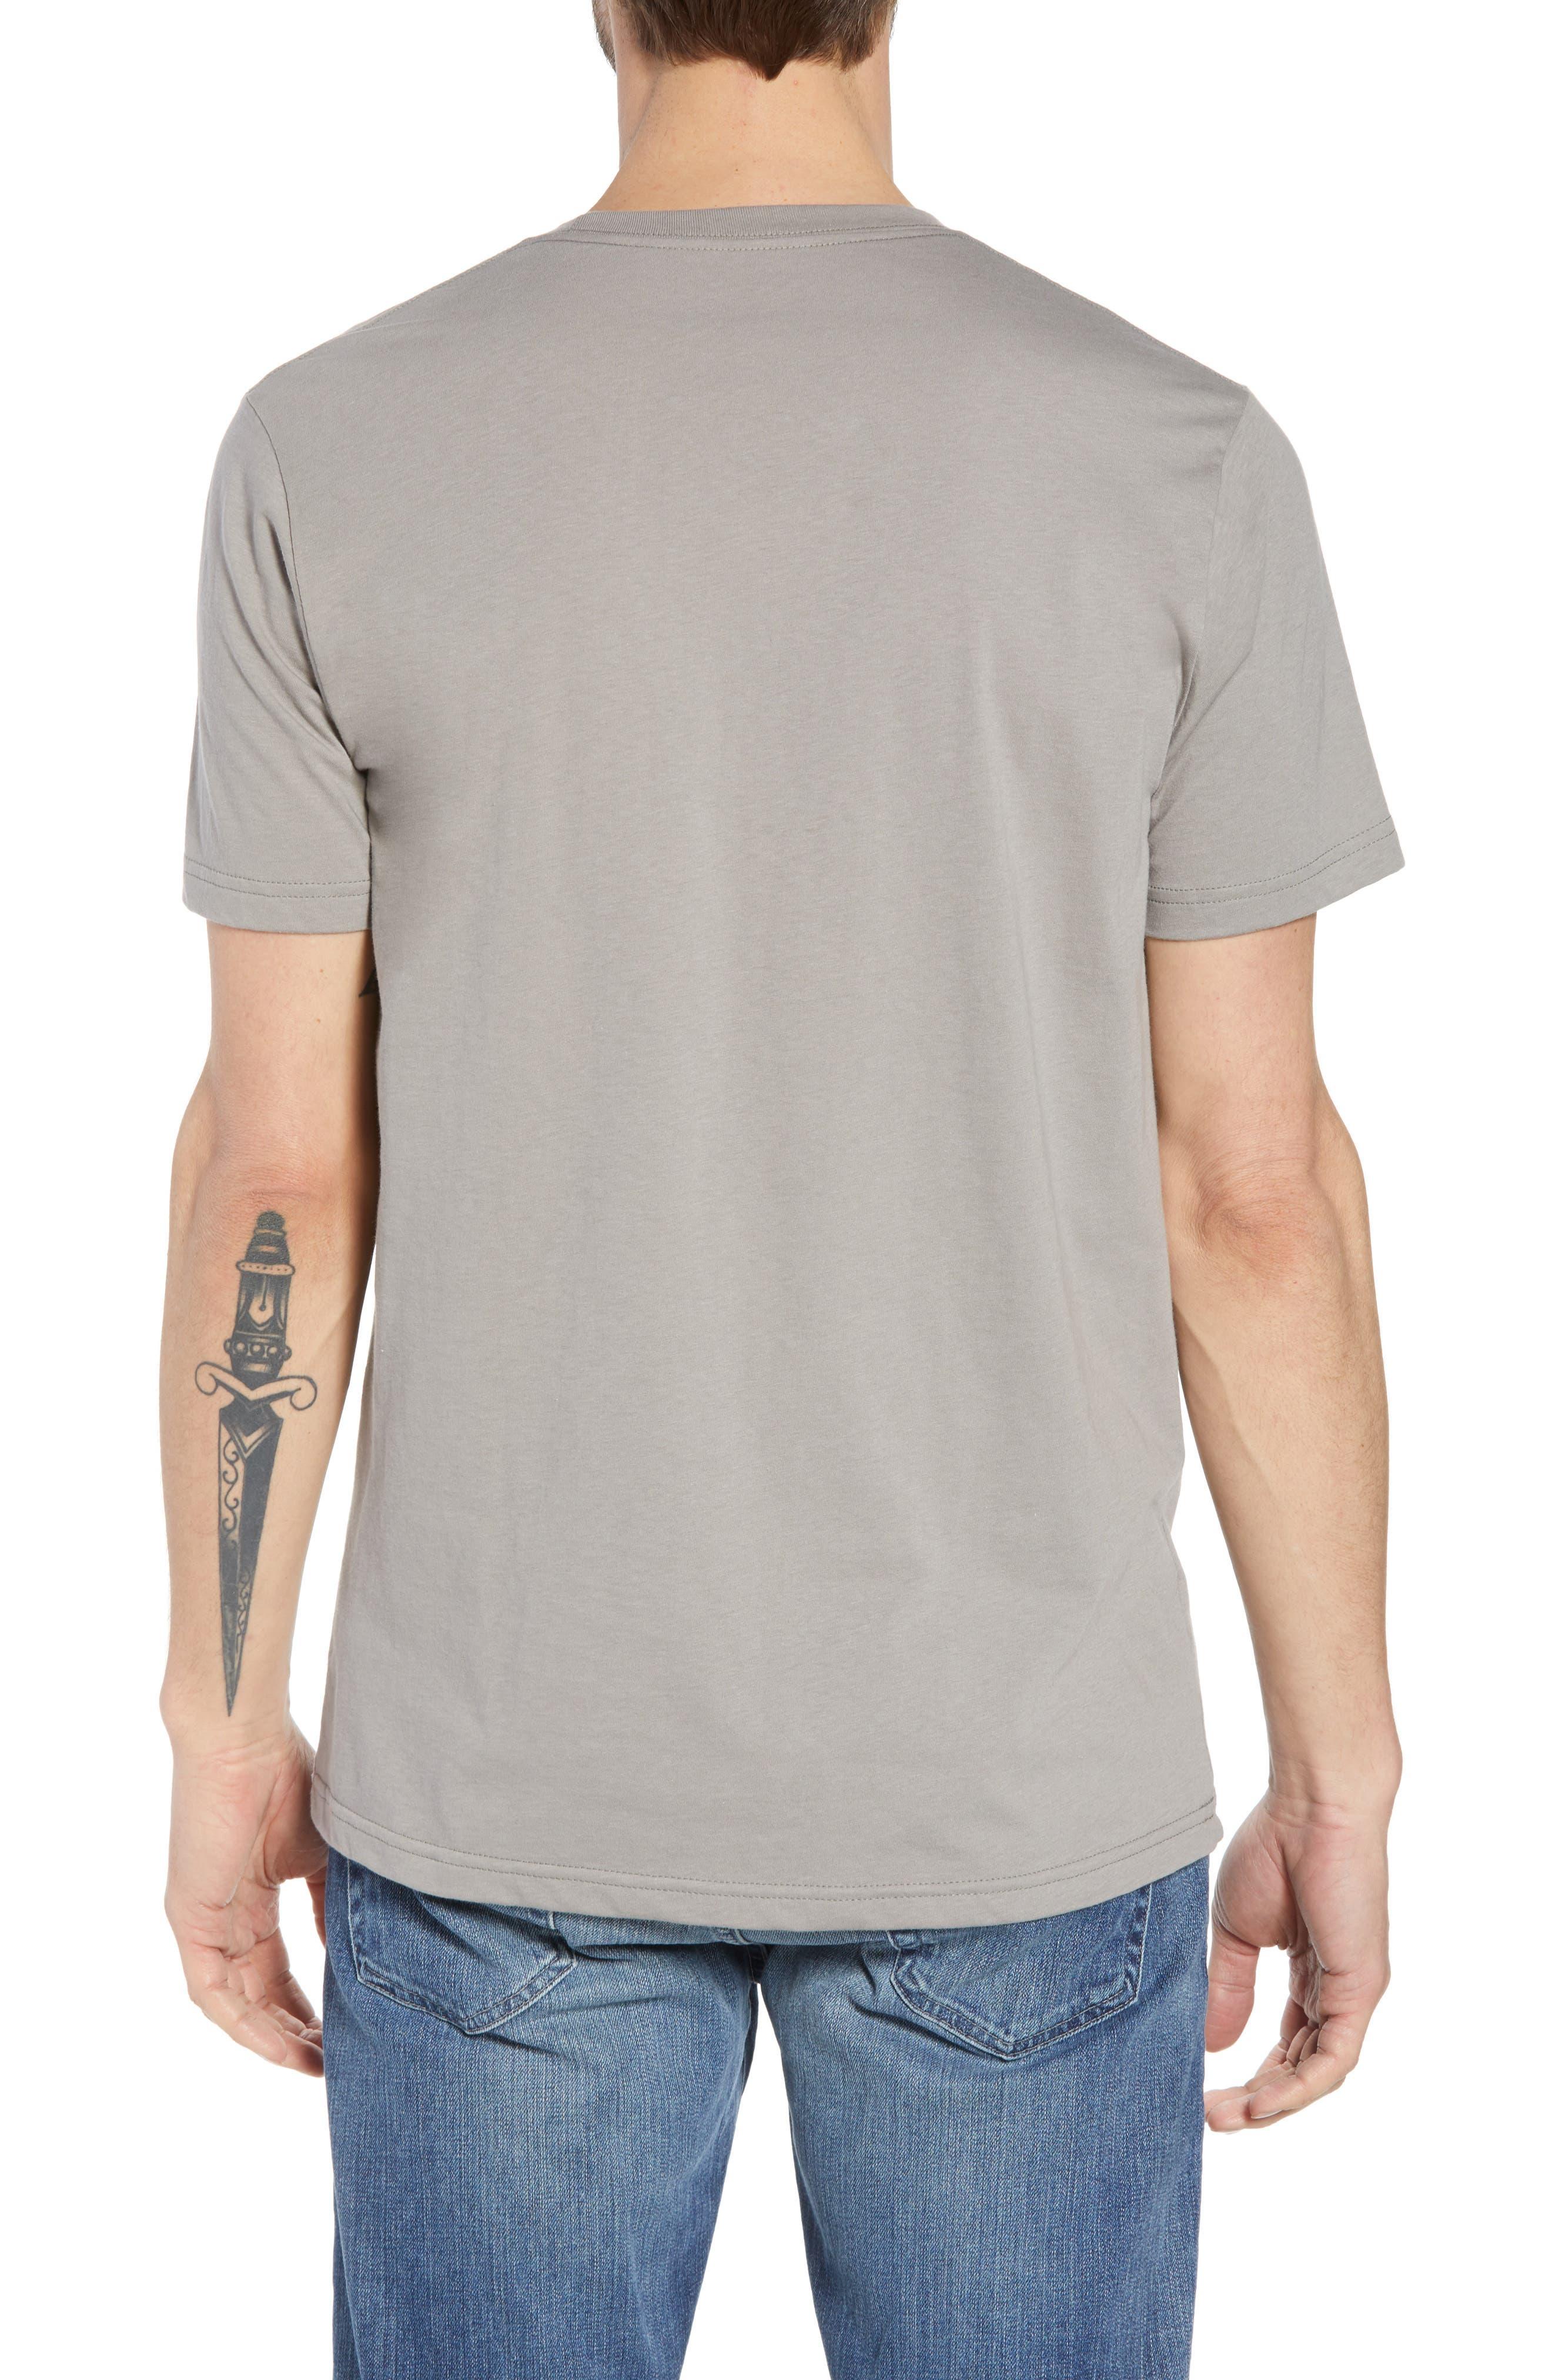 PATAGONIA, Fitz Roy Scope Crewneck T-Shirt, Alternate thumbnail 2, color, FEATHER GREY